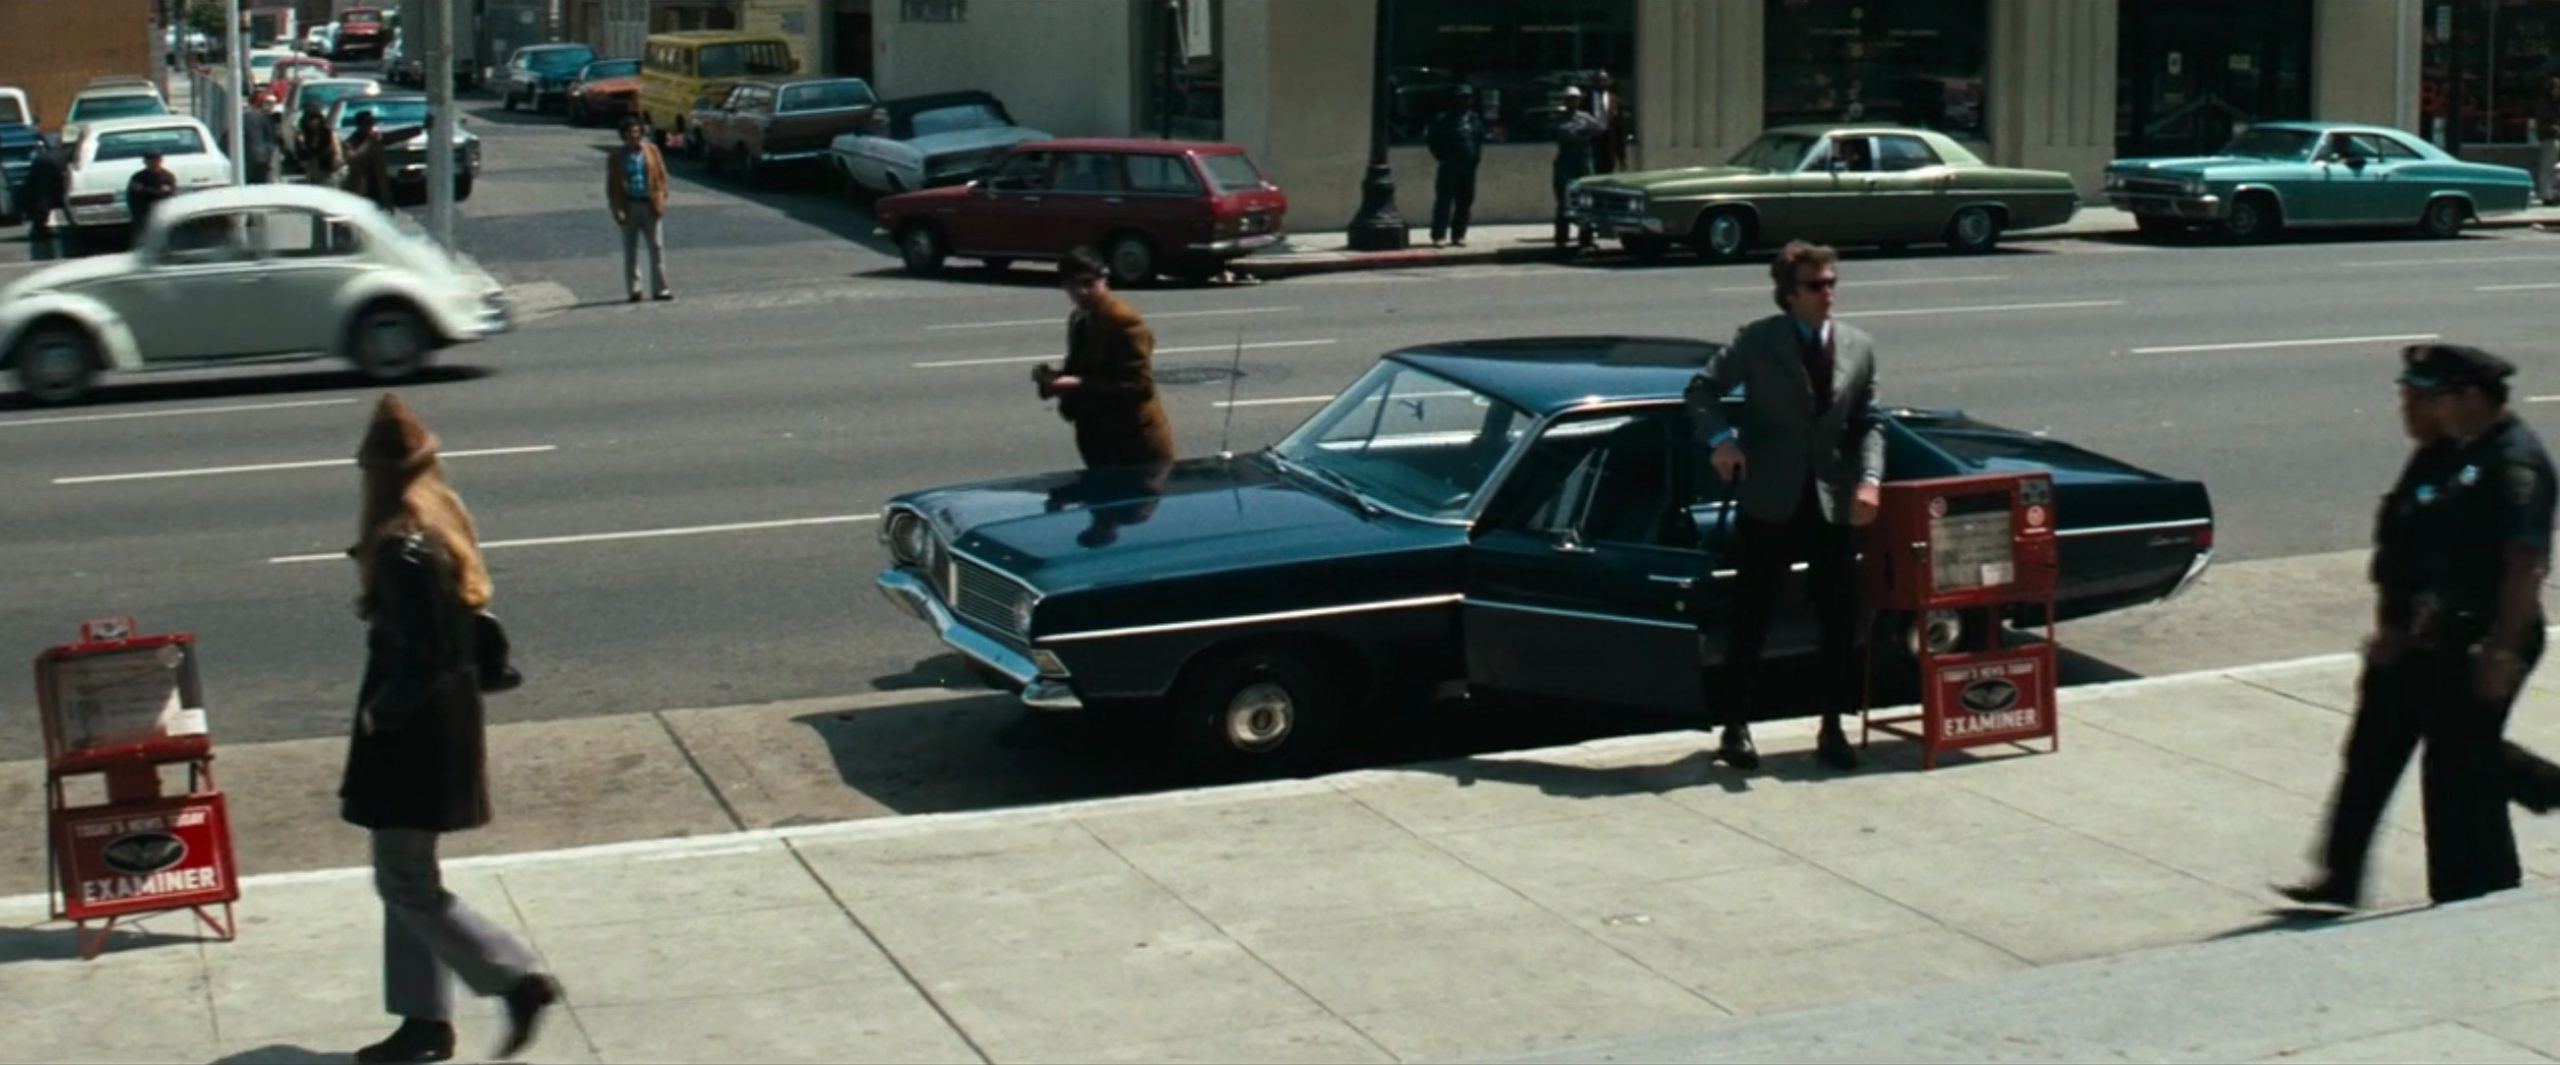 1968 Ford Custom 500 clint eastwood parking still